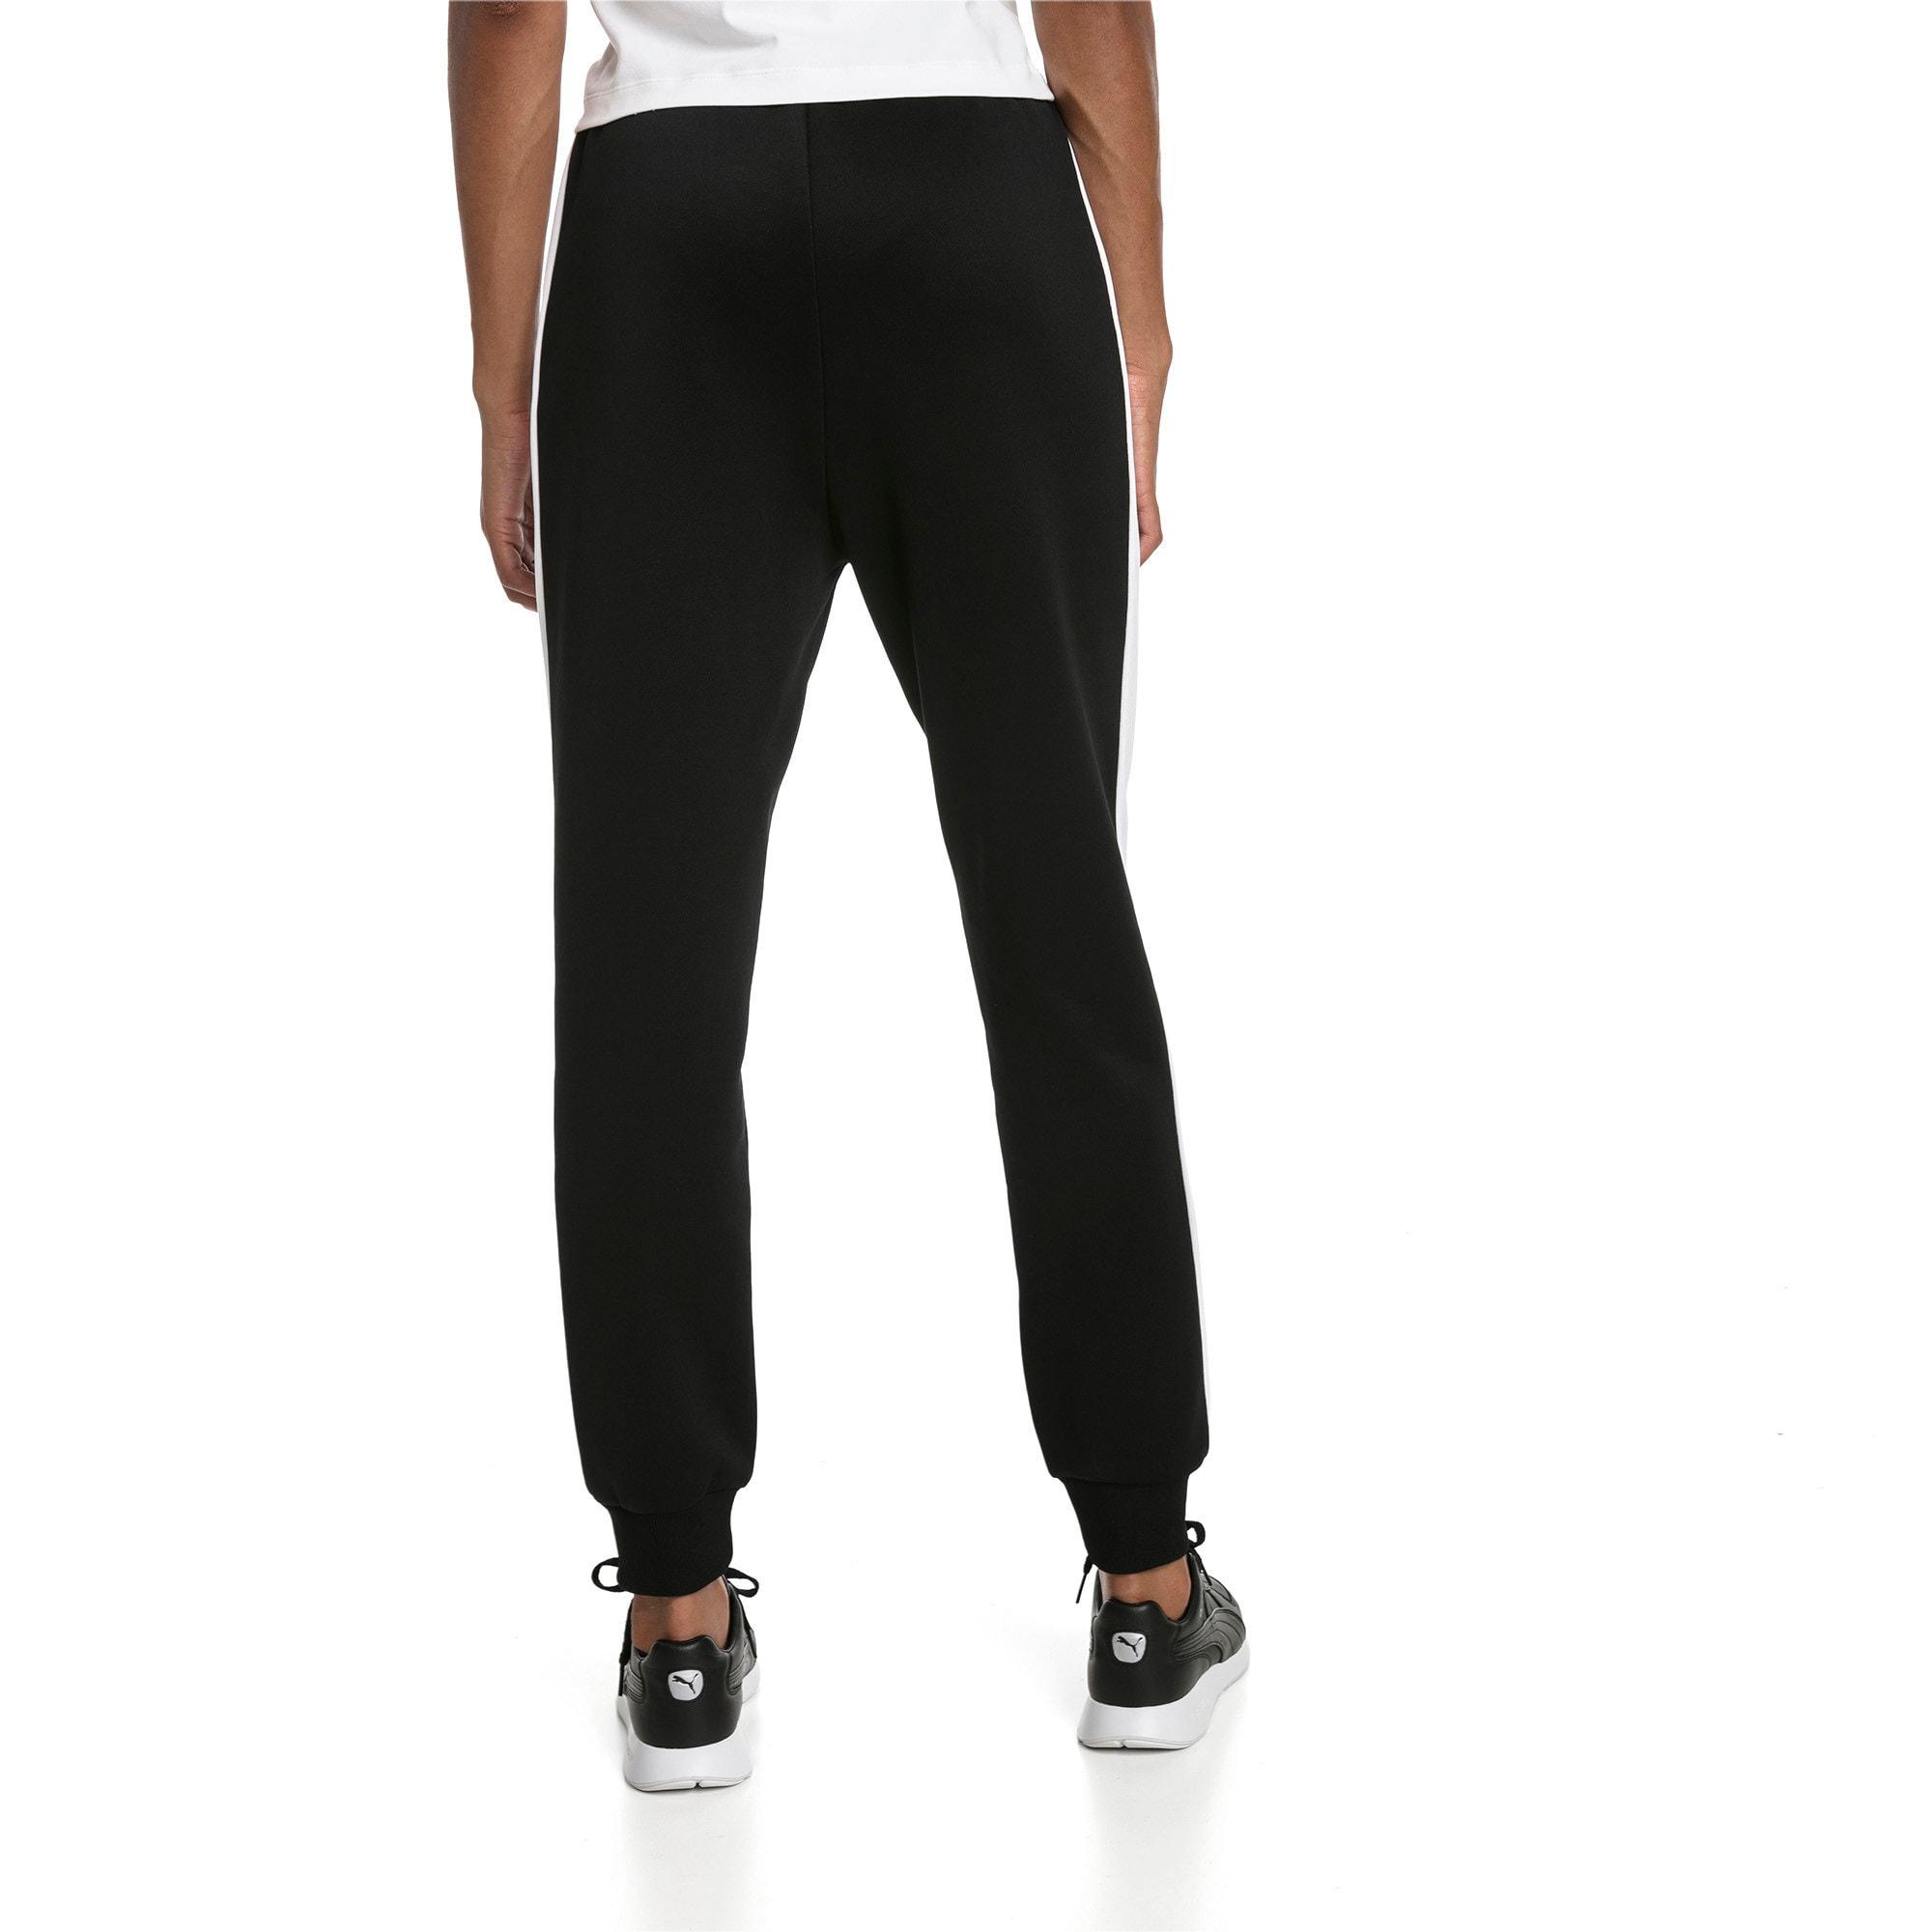 Thumbnail 2 of Classics T7 Knitted Women's Track Pants, Puma Black, medium